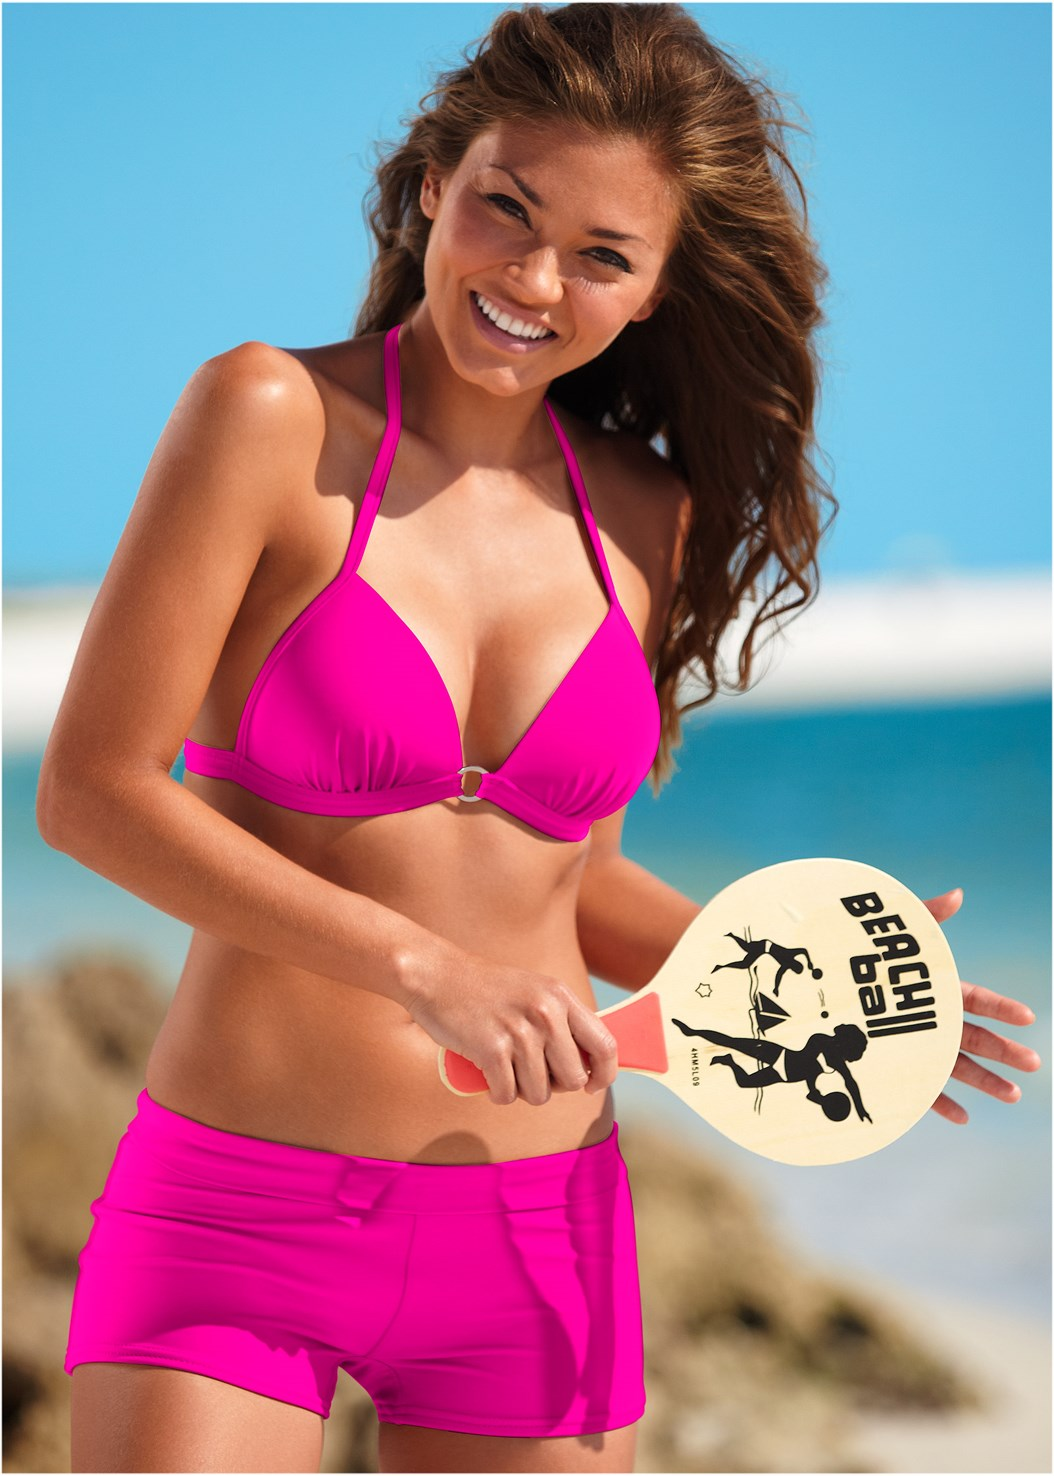 Swim Short,Enhancer Push Up Ring Halter Triangle Top